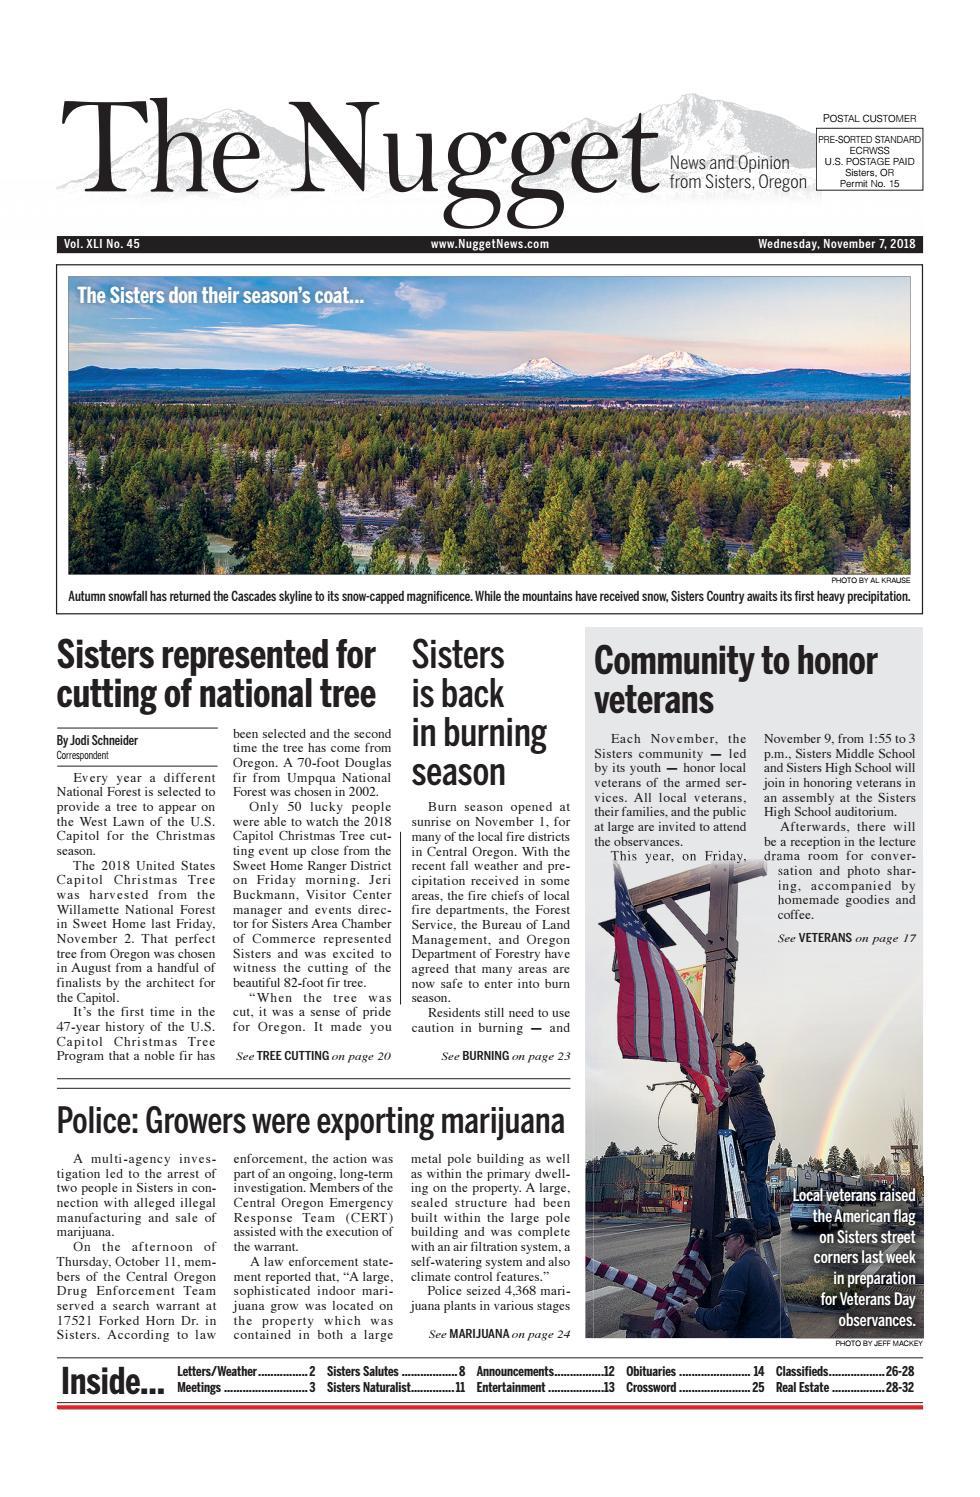 The Nugget Newspaper // Vol  XLI No  45 // 2018-11-7 by